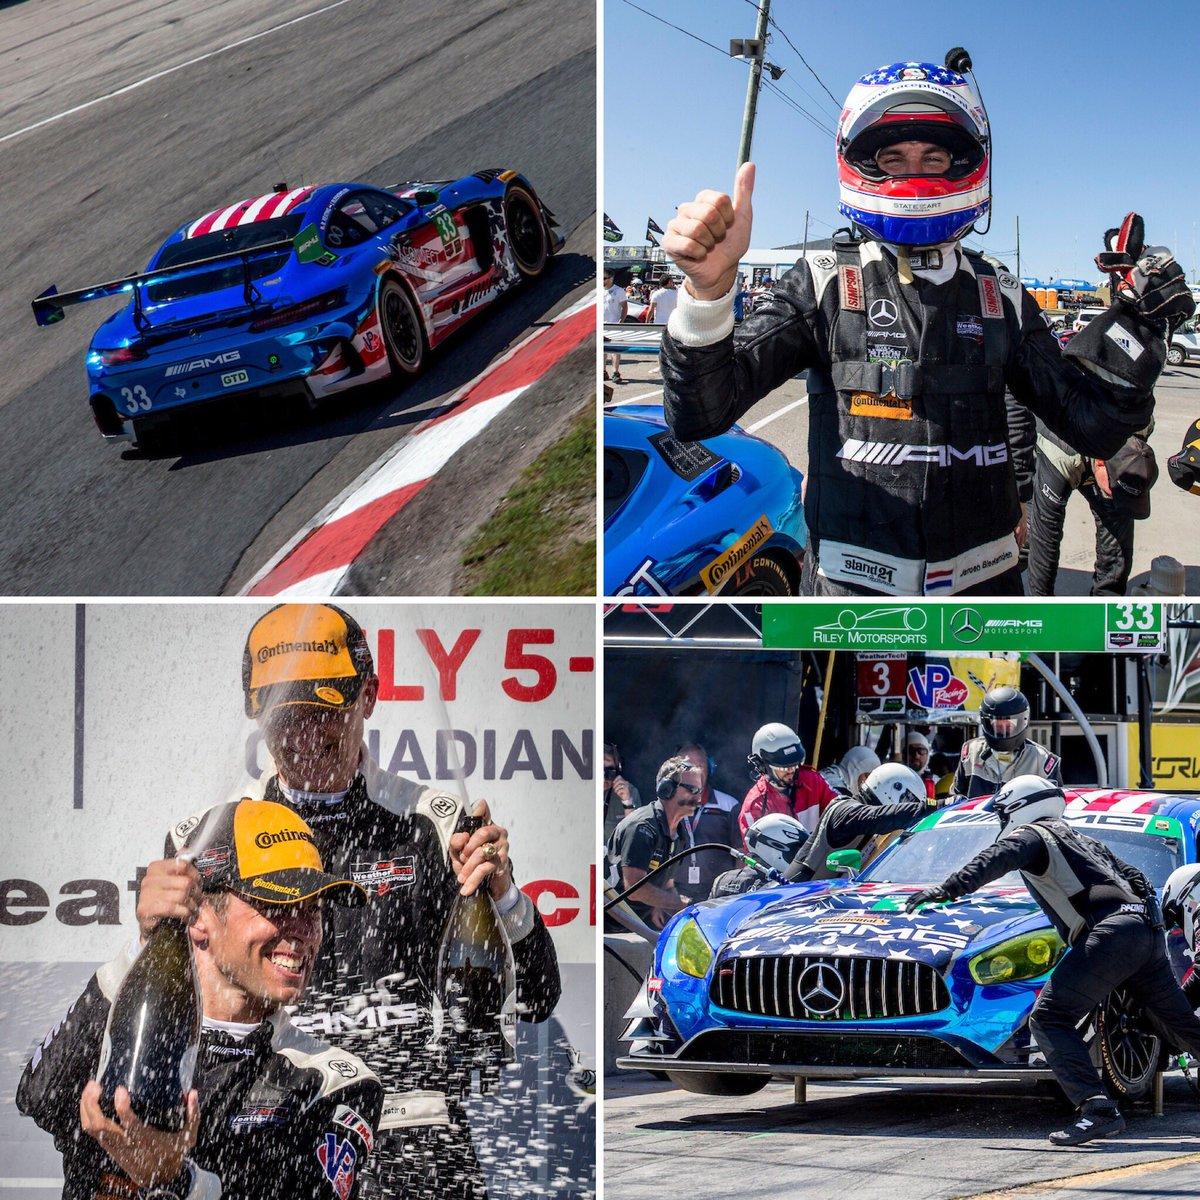 Bill riley racing